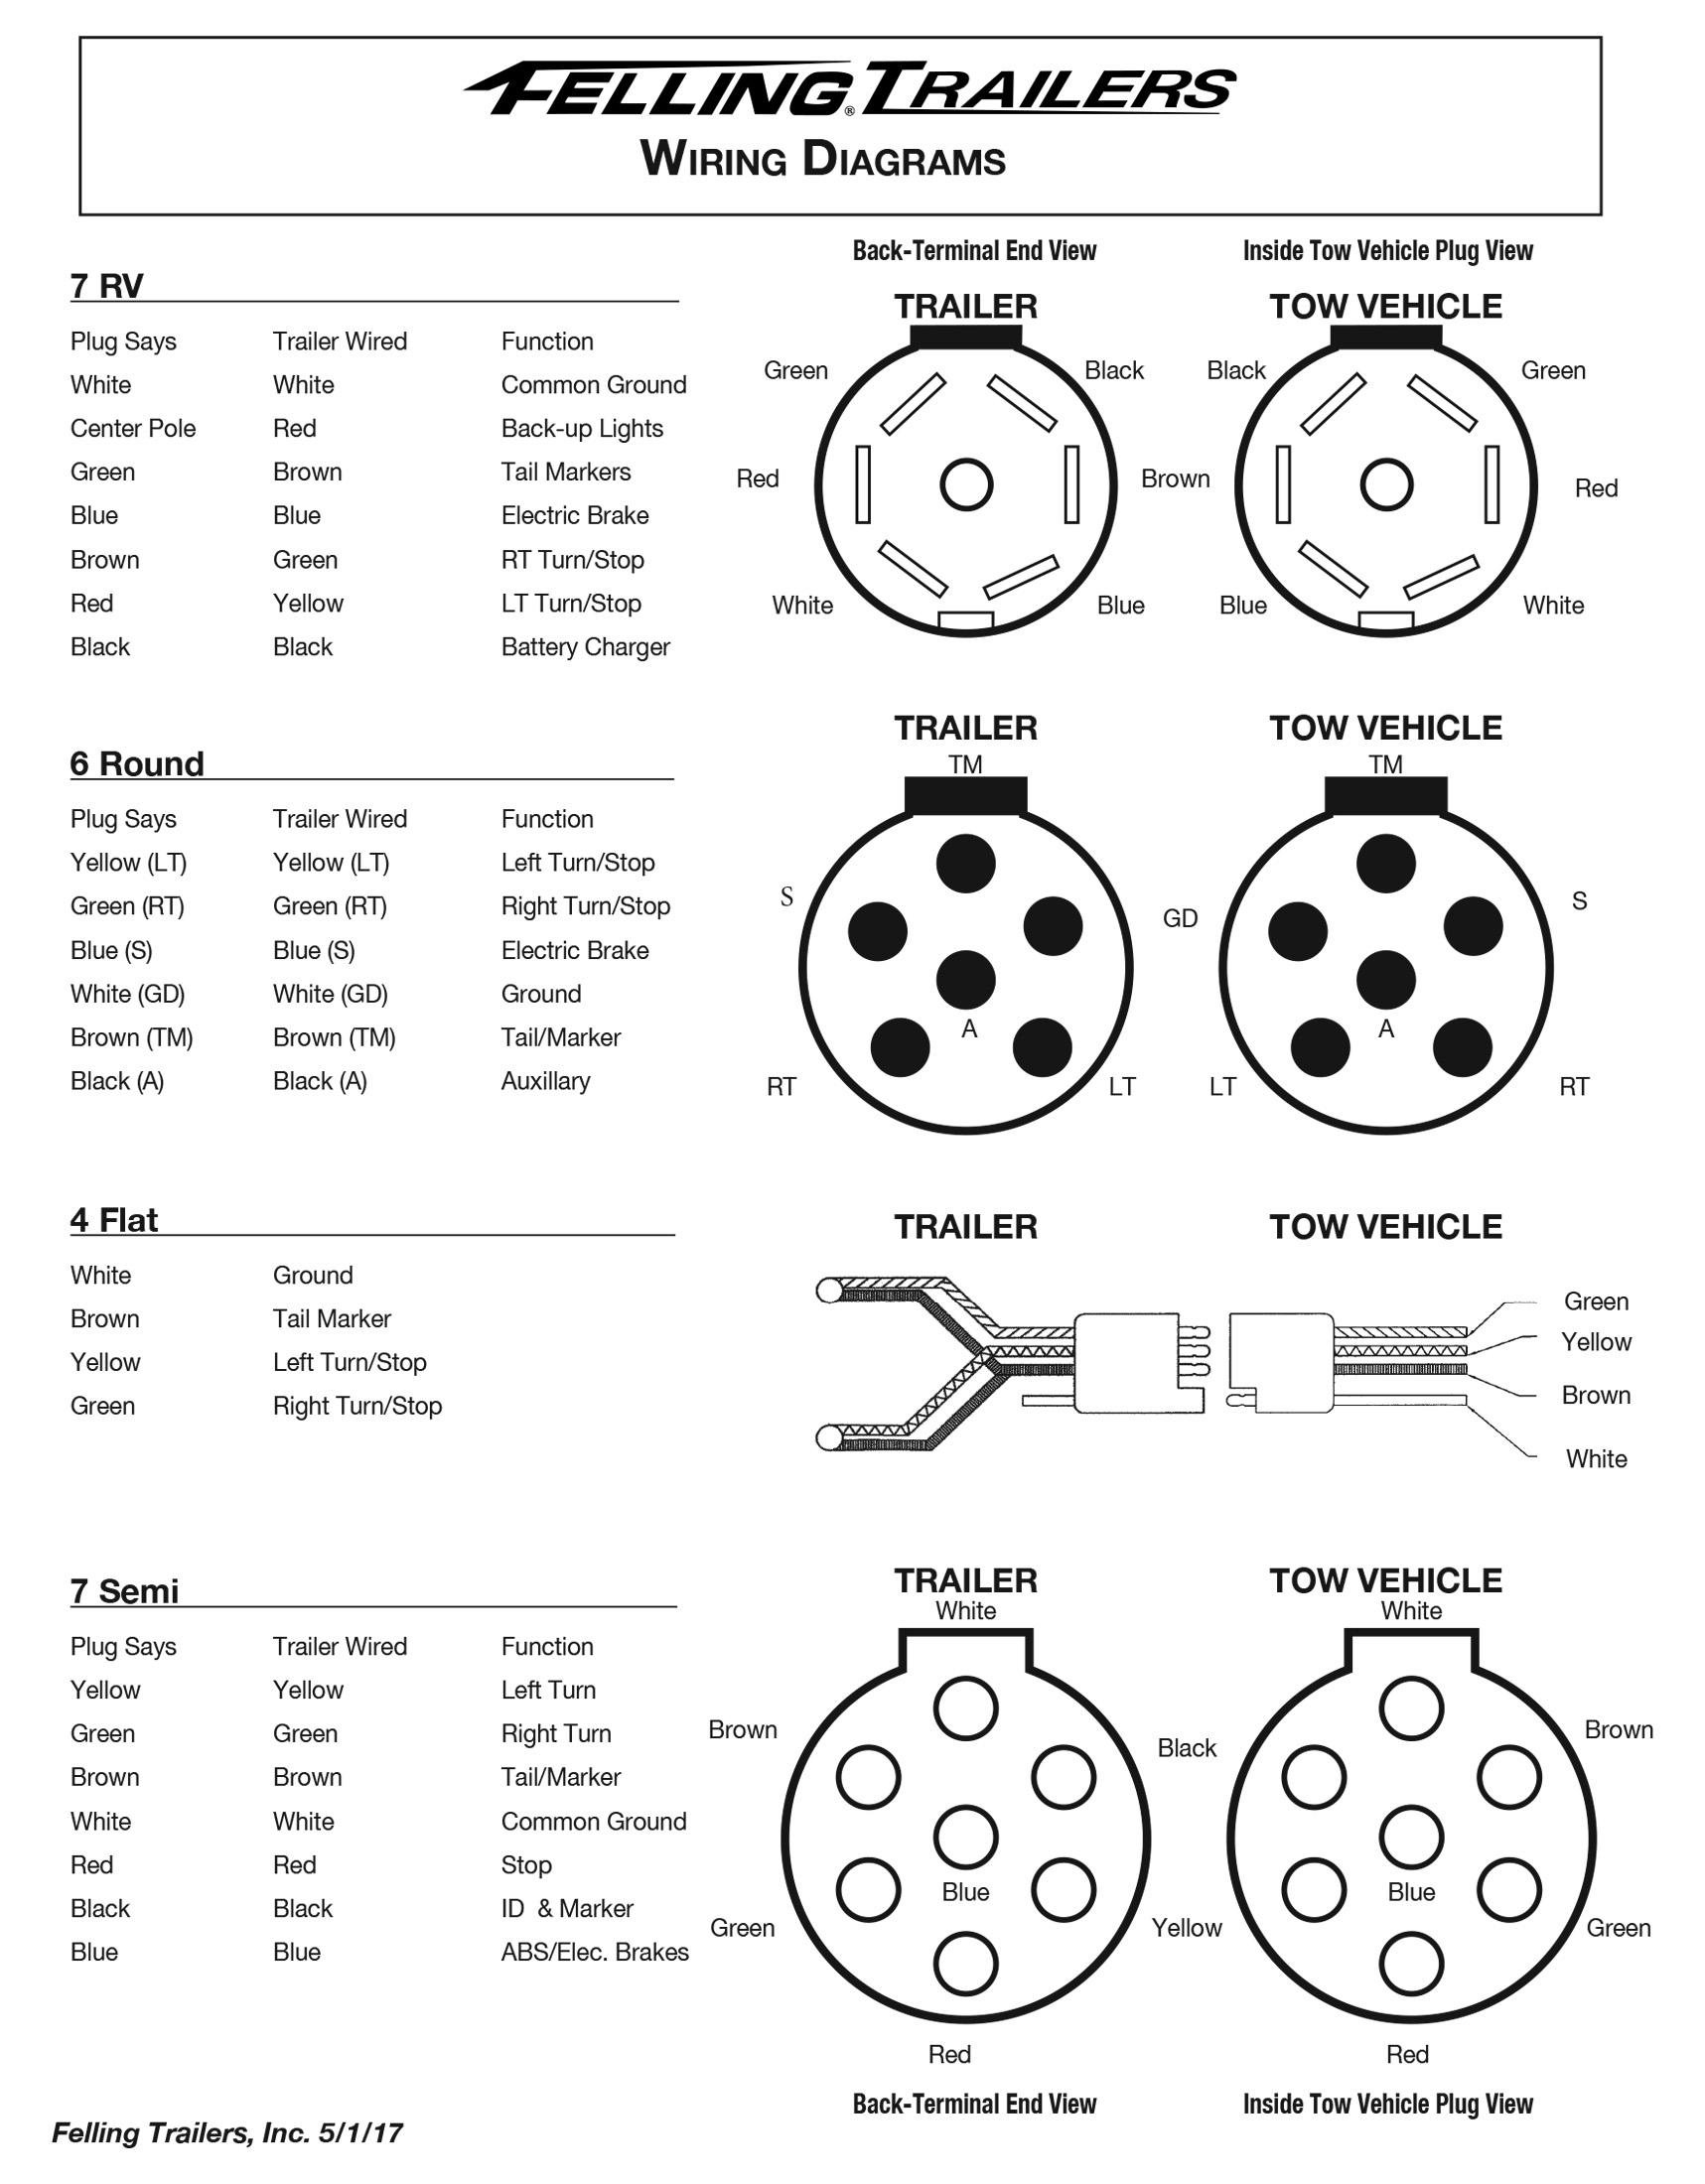 Miraculous Service Felling Trailers Wiring Diagrams Wheel Toque Wiring Cloud Filiciilluminateatxorg